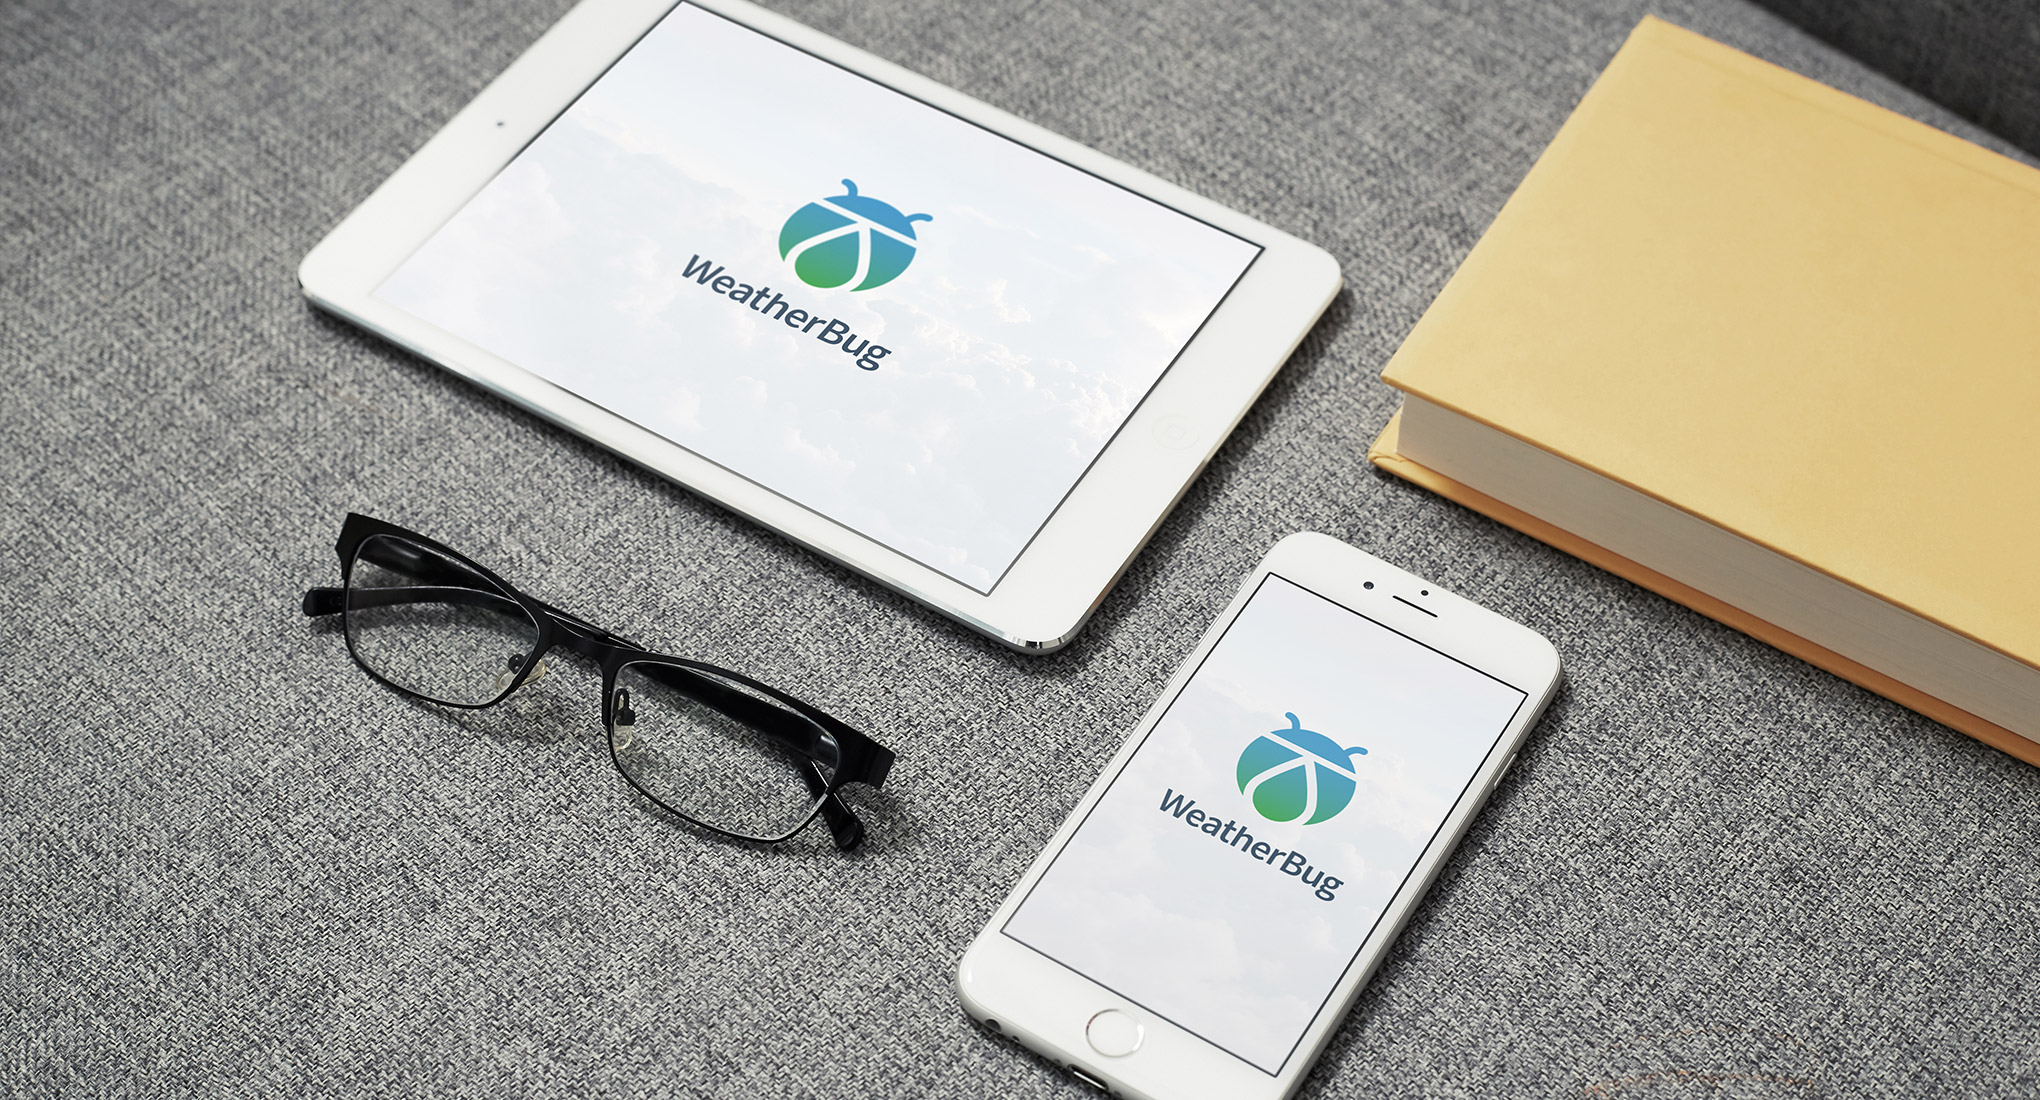 wb-branding-proposal-4.jpg